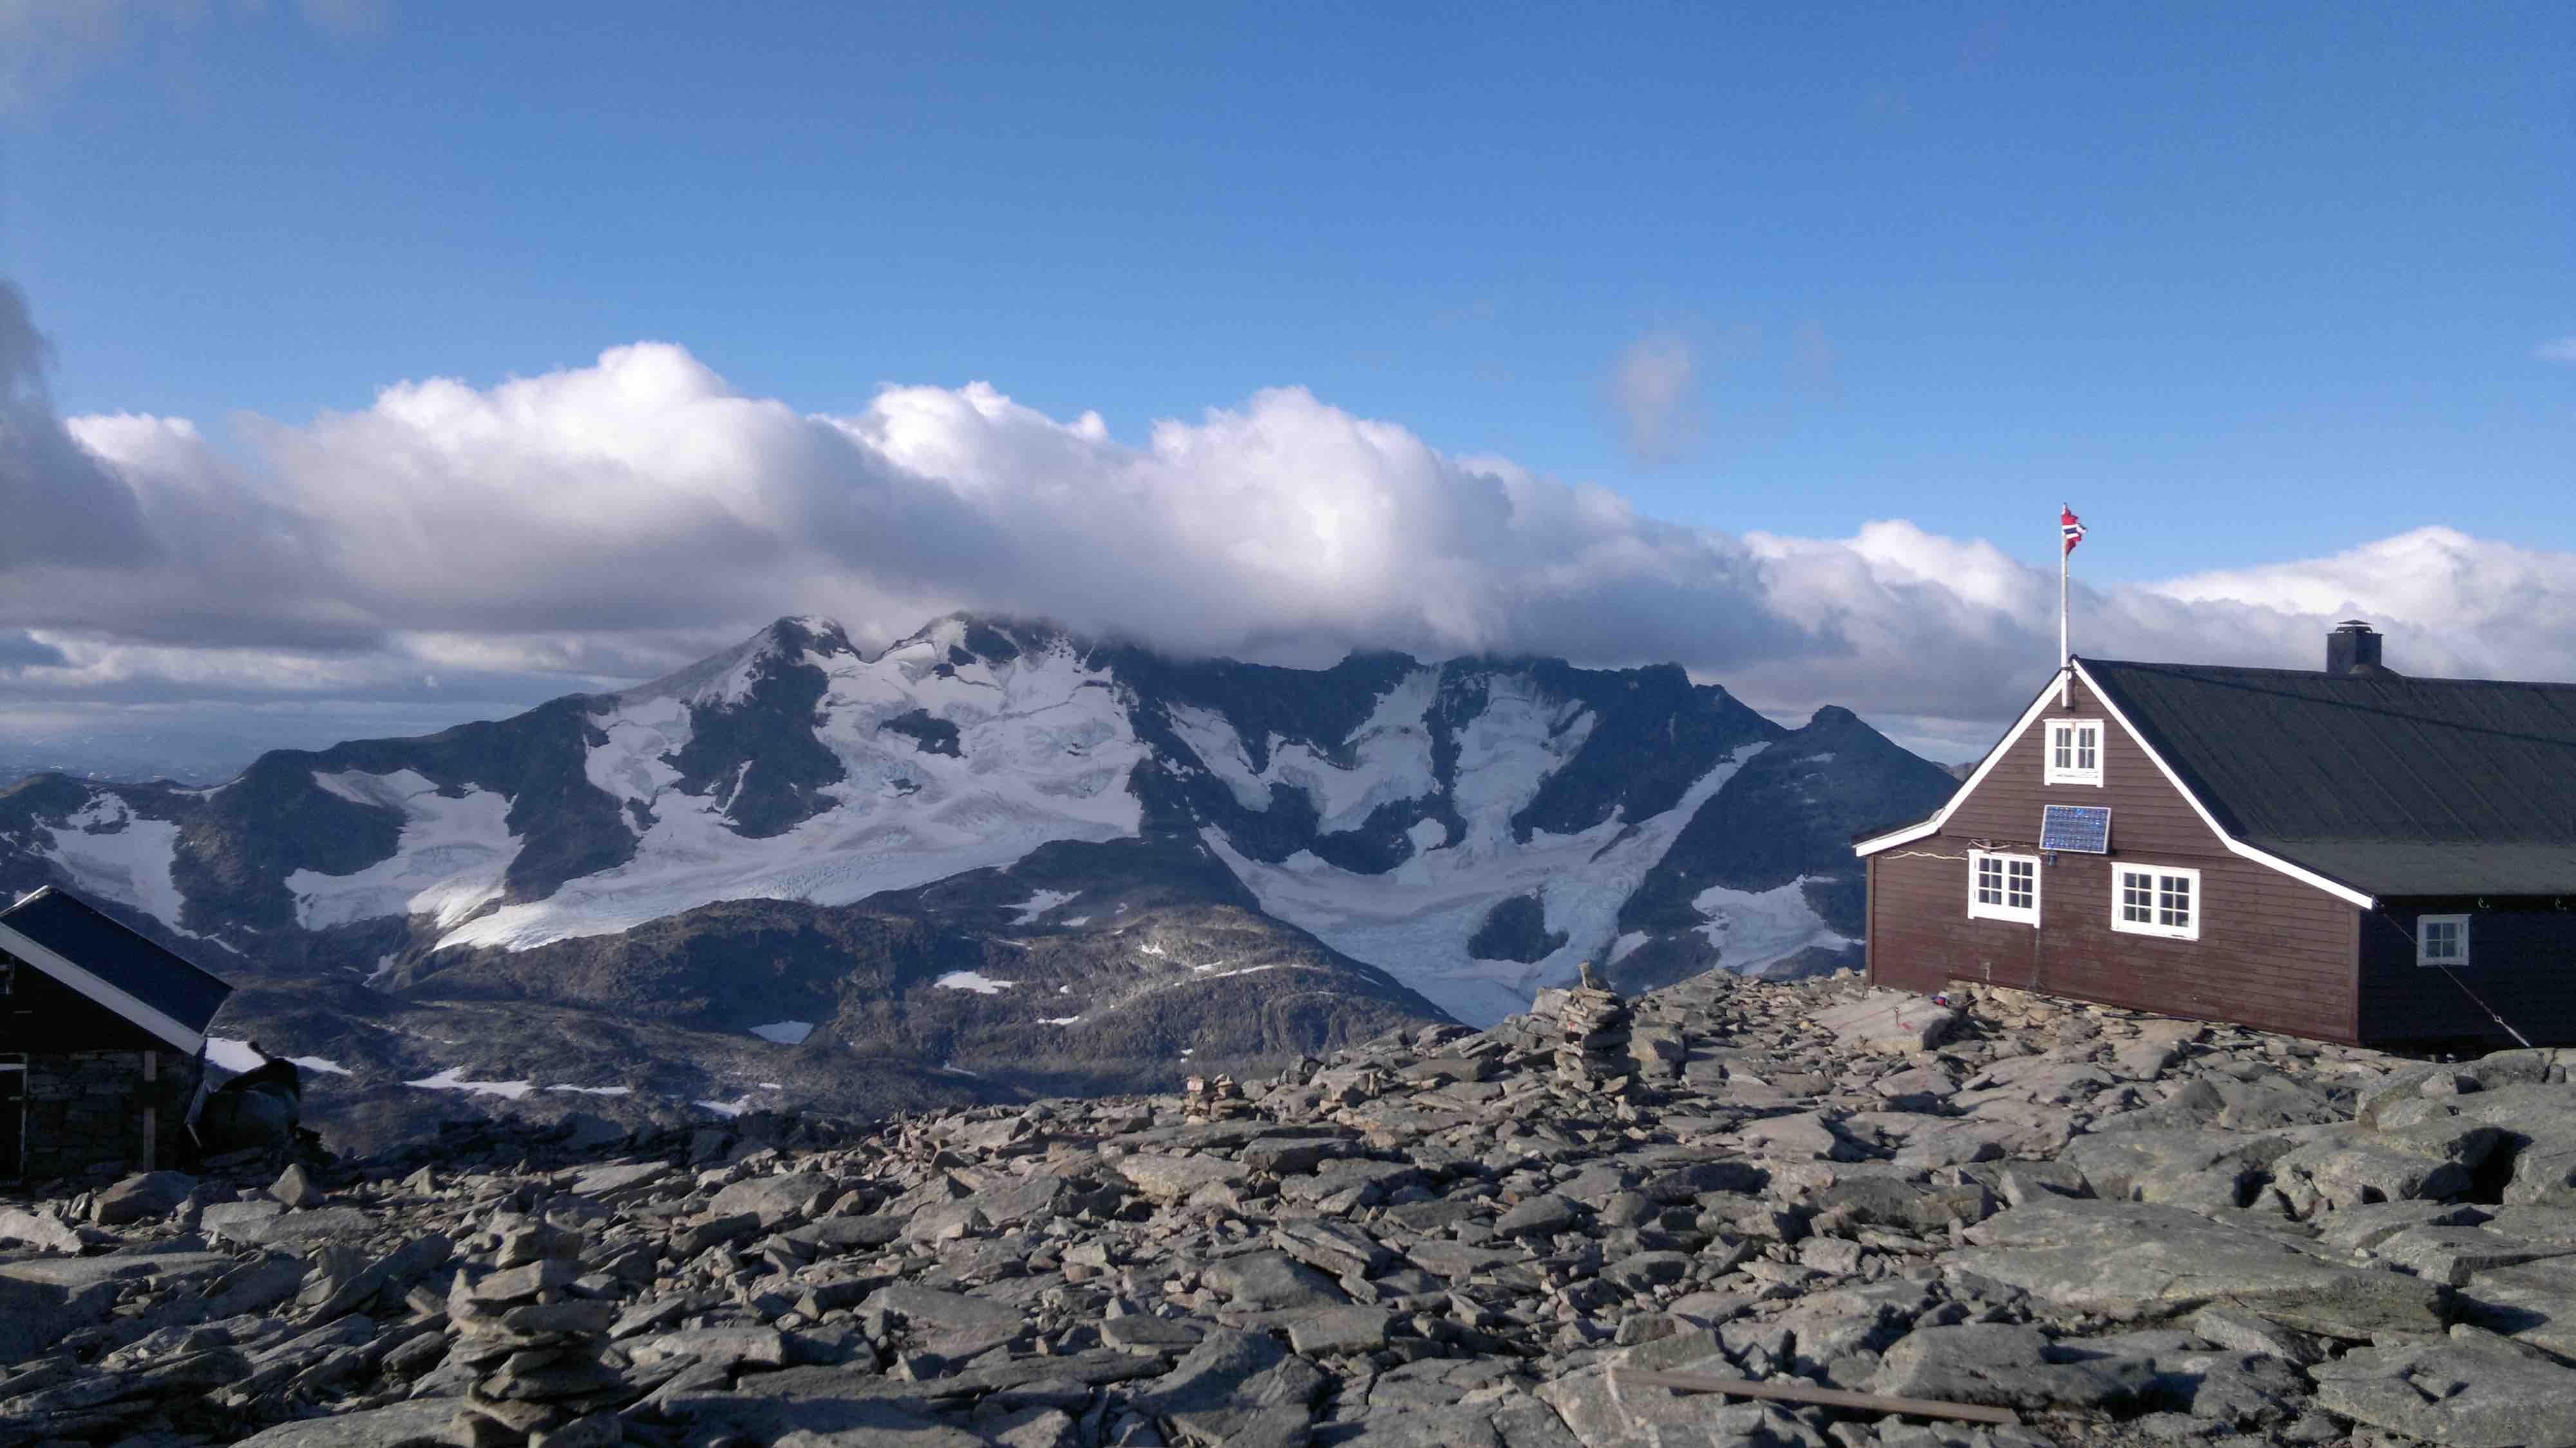 2-dagers tur til Fanaråken  13-14.august